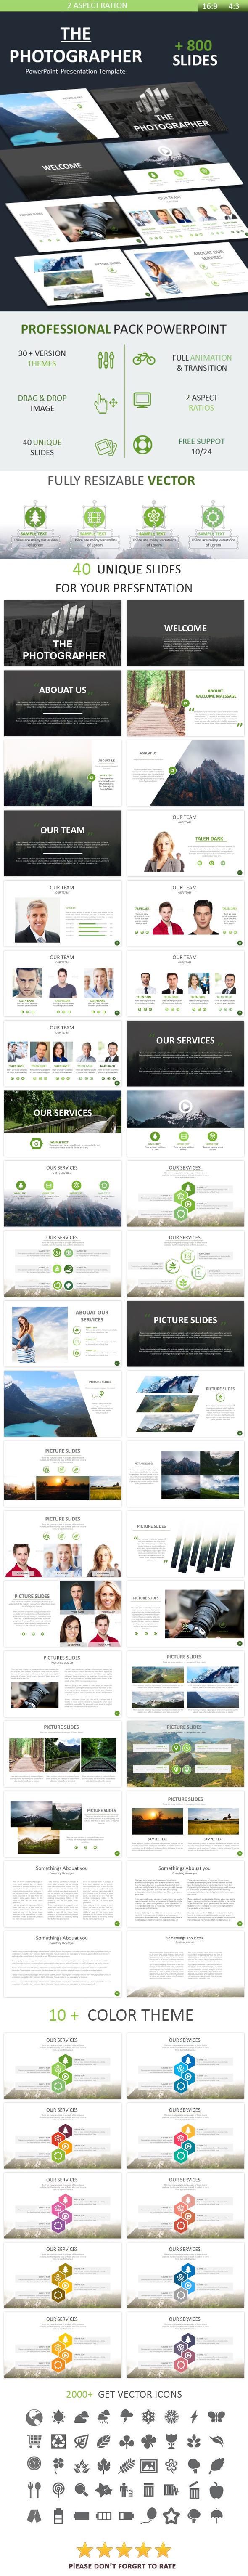 The Photographer Powerpoint Presentation Template - PowerPoint Templates Presentation Templates